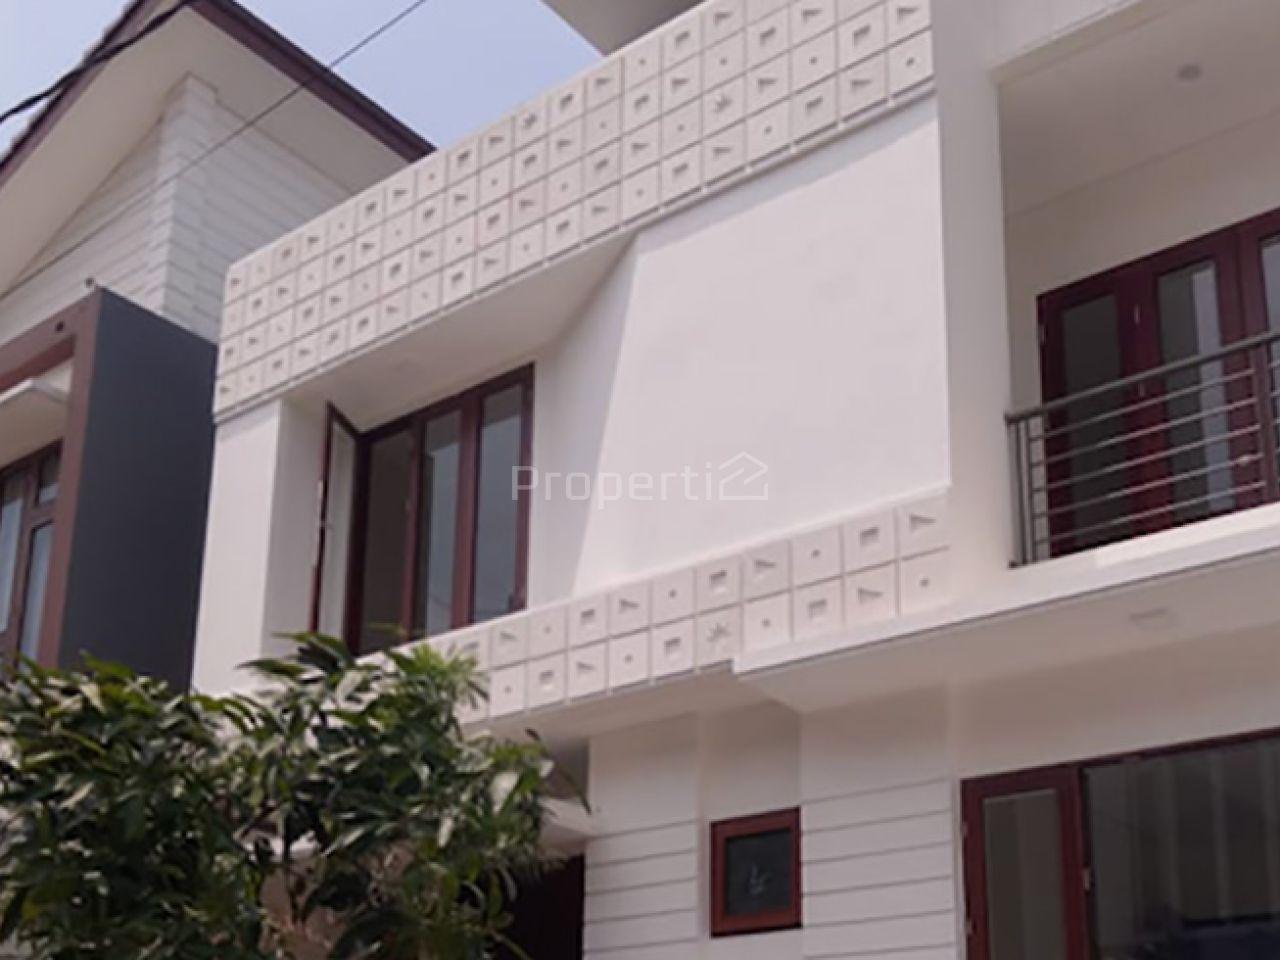 Rumah Baru 2 Lantai dengan Basement dalam Cluster di Lebak Bulus, DKI Jakarta